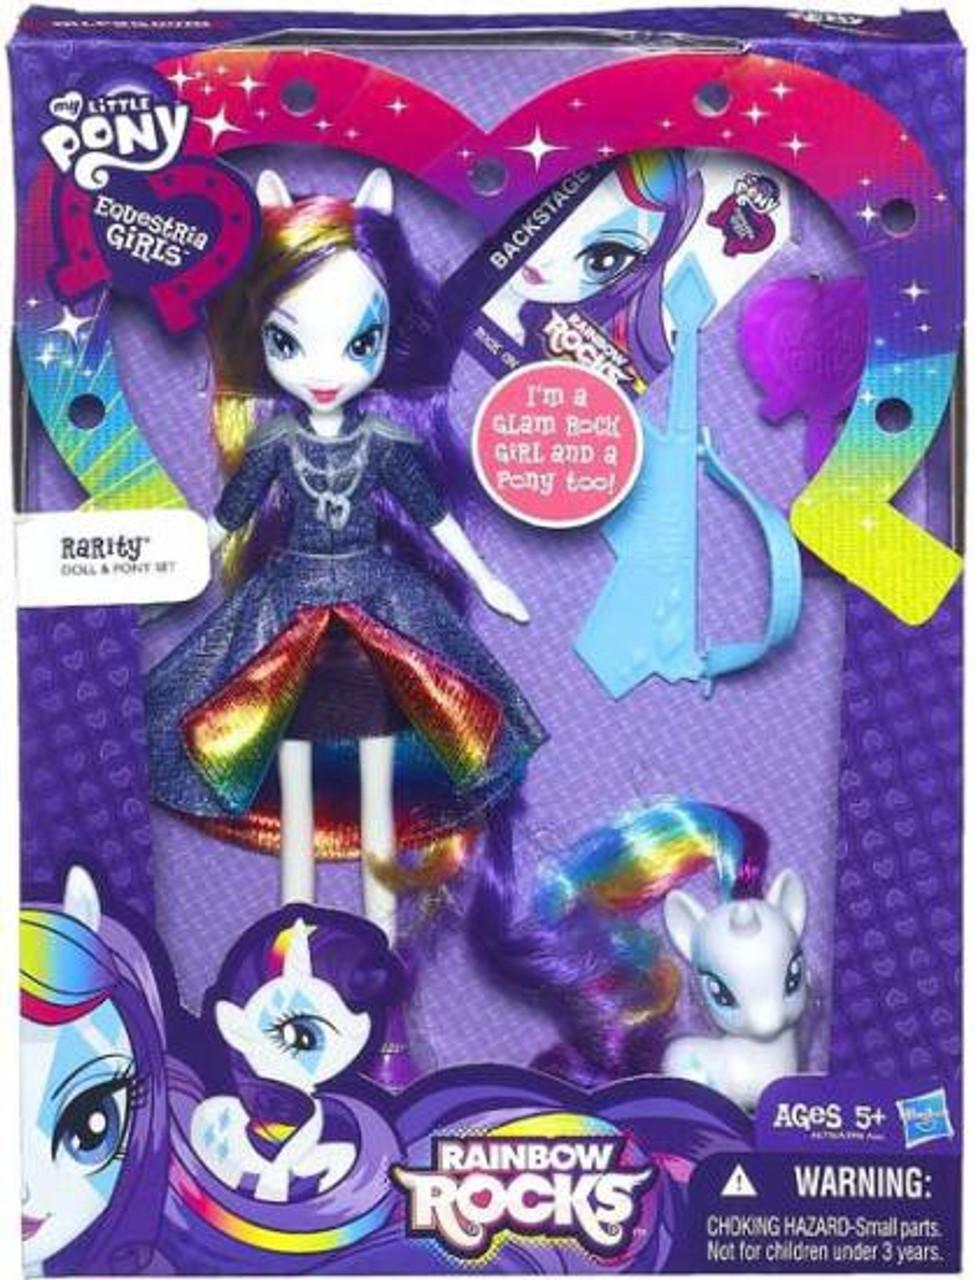 My Little Pony Equestria Girls Rainbow Rocks Rarity 9-Inch Doll & Pony Set